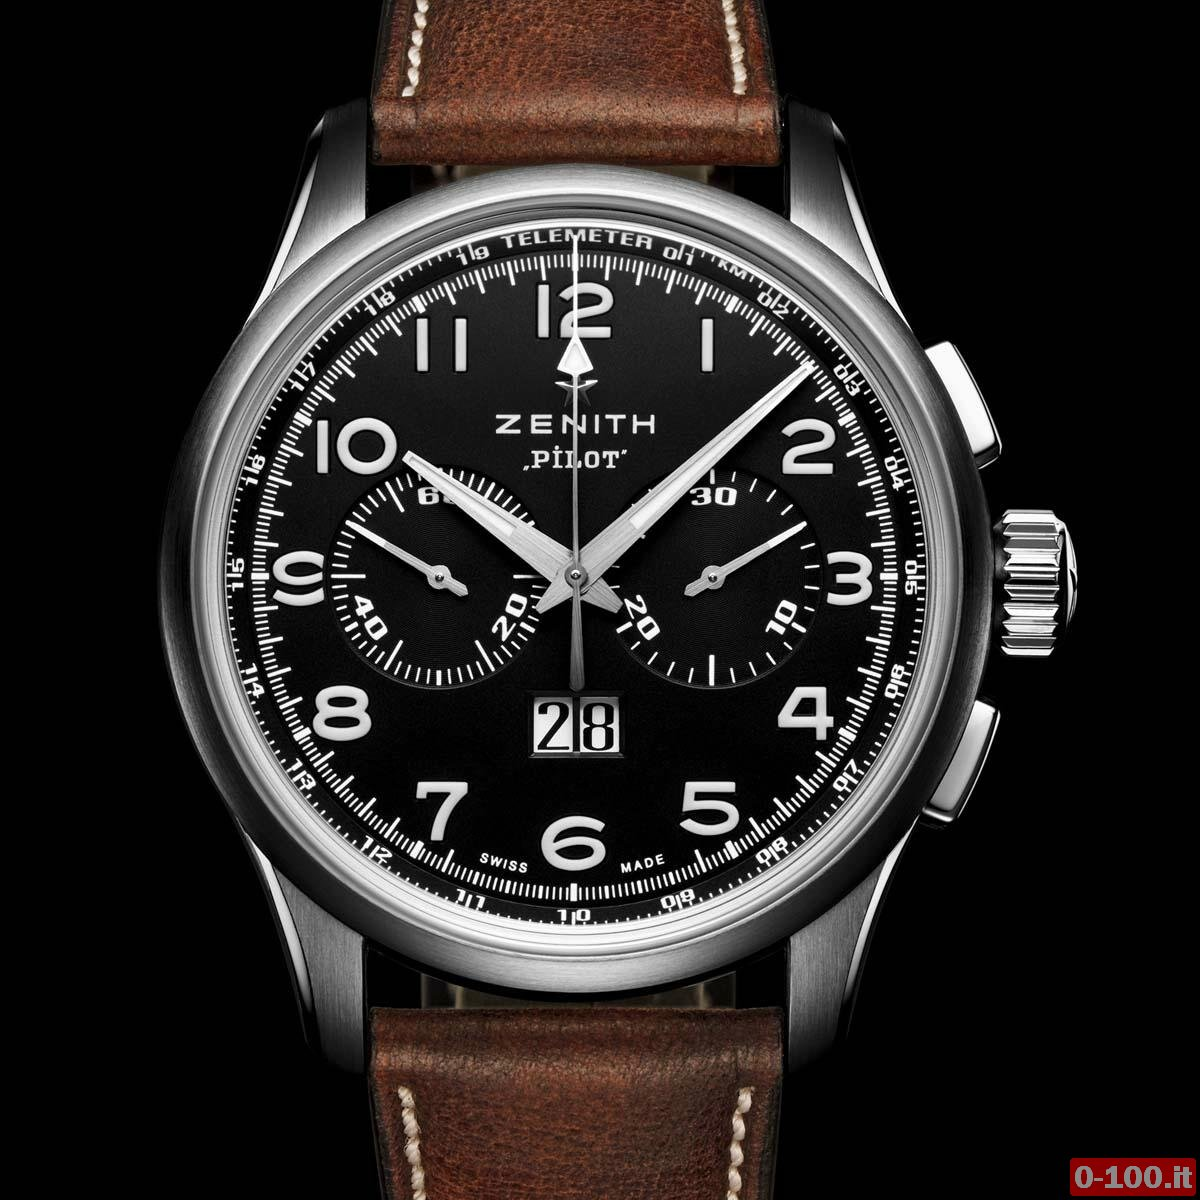 zenith-pilot-big-date-special_0-100_19